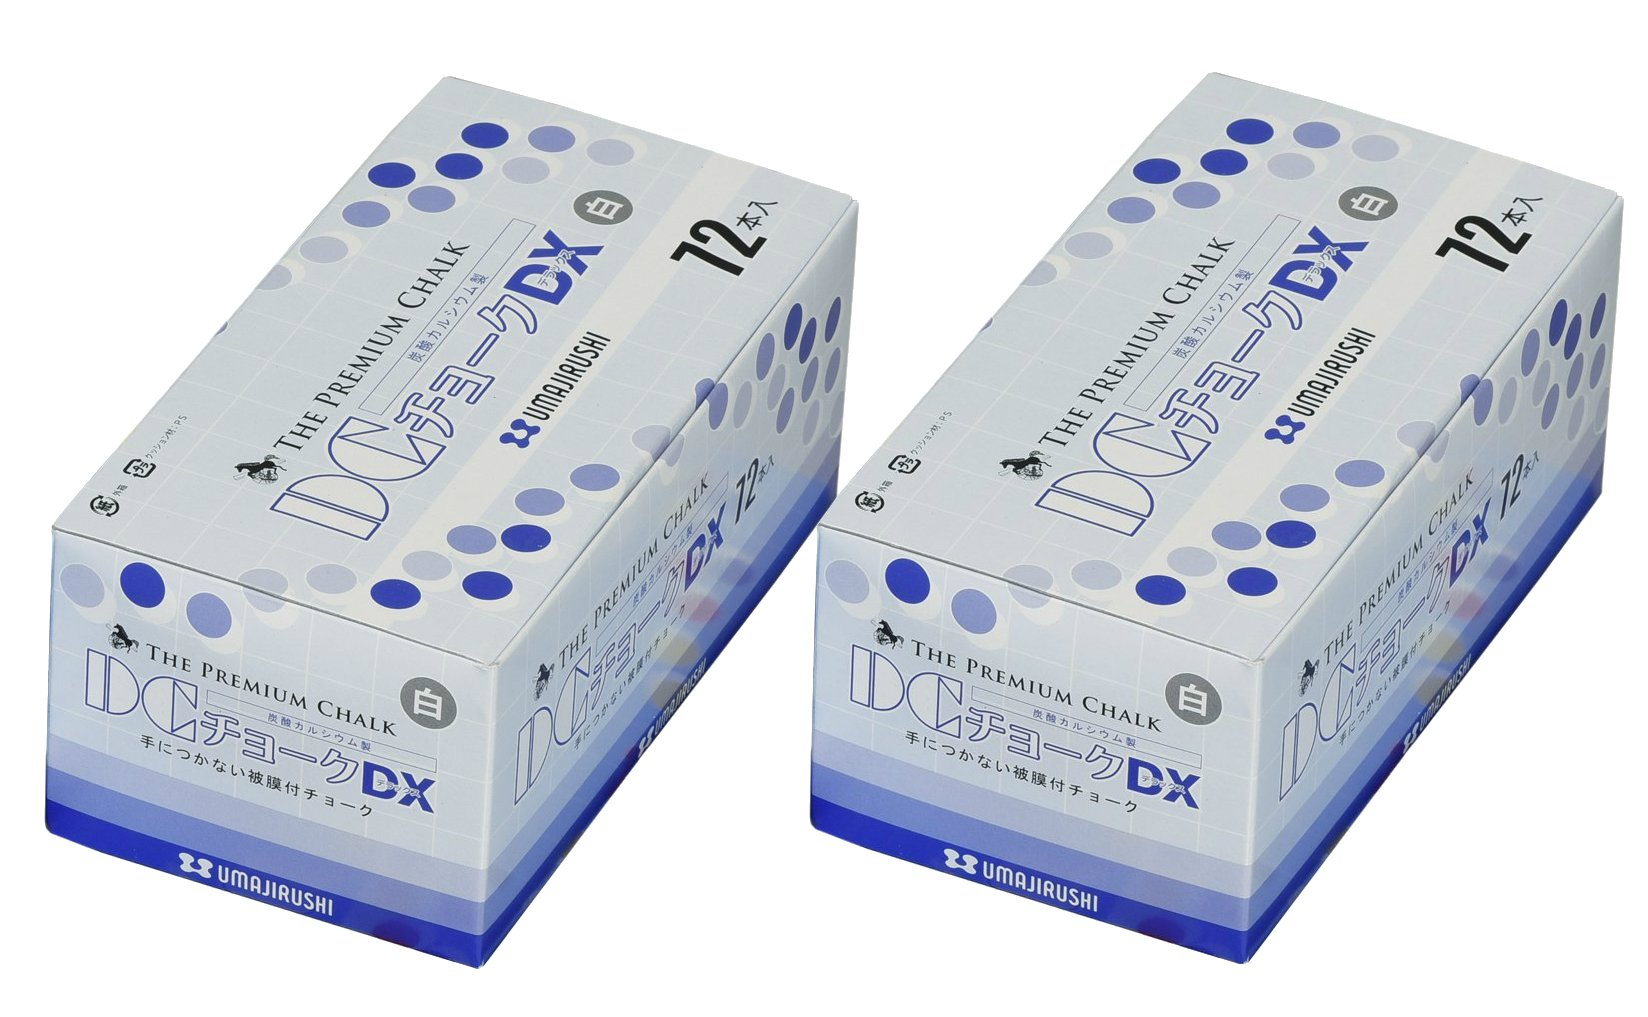 2 X UMAJIRUSHI The Premium Chalk, DC Chalk DX 72pcs White, Made in Japan